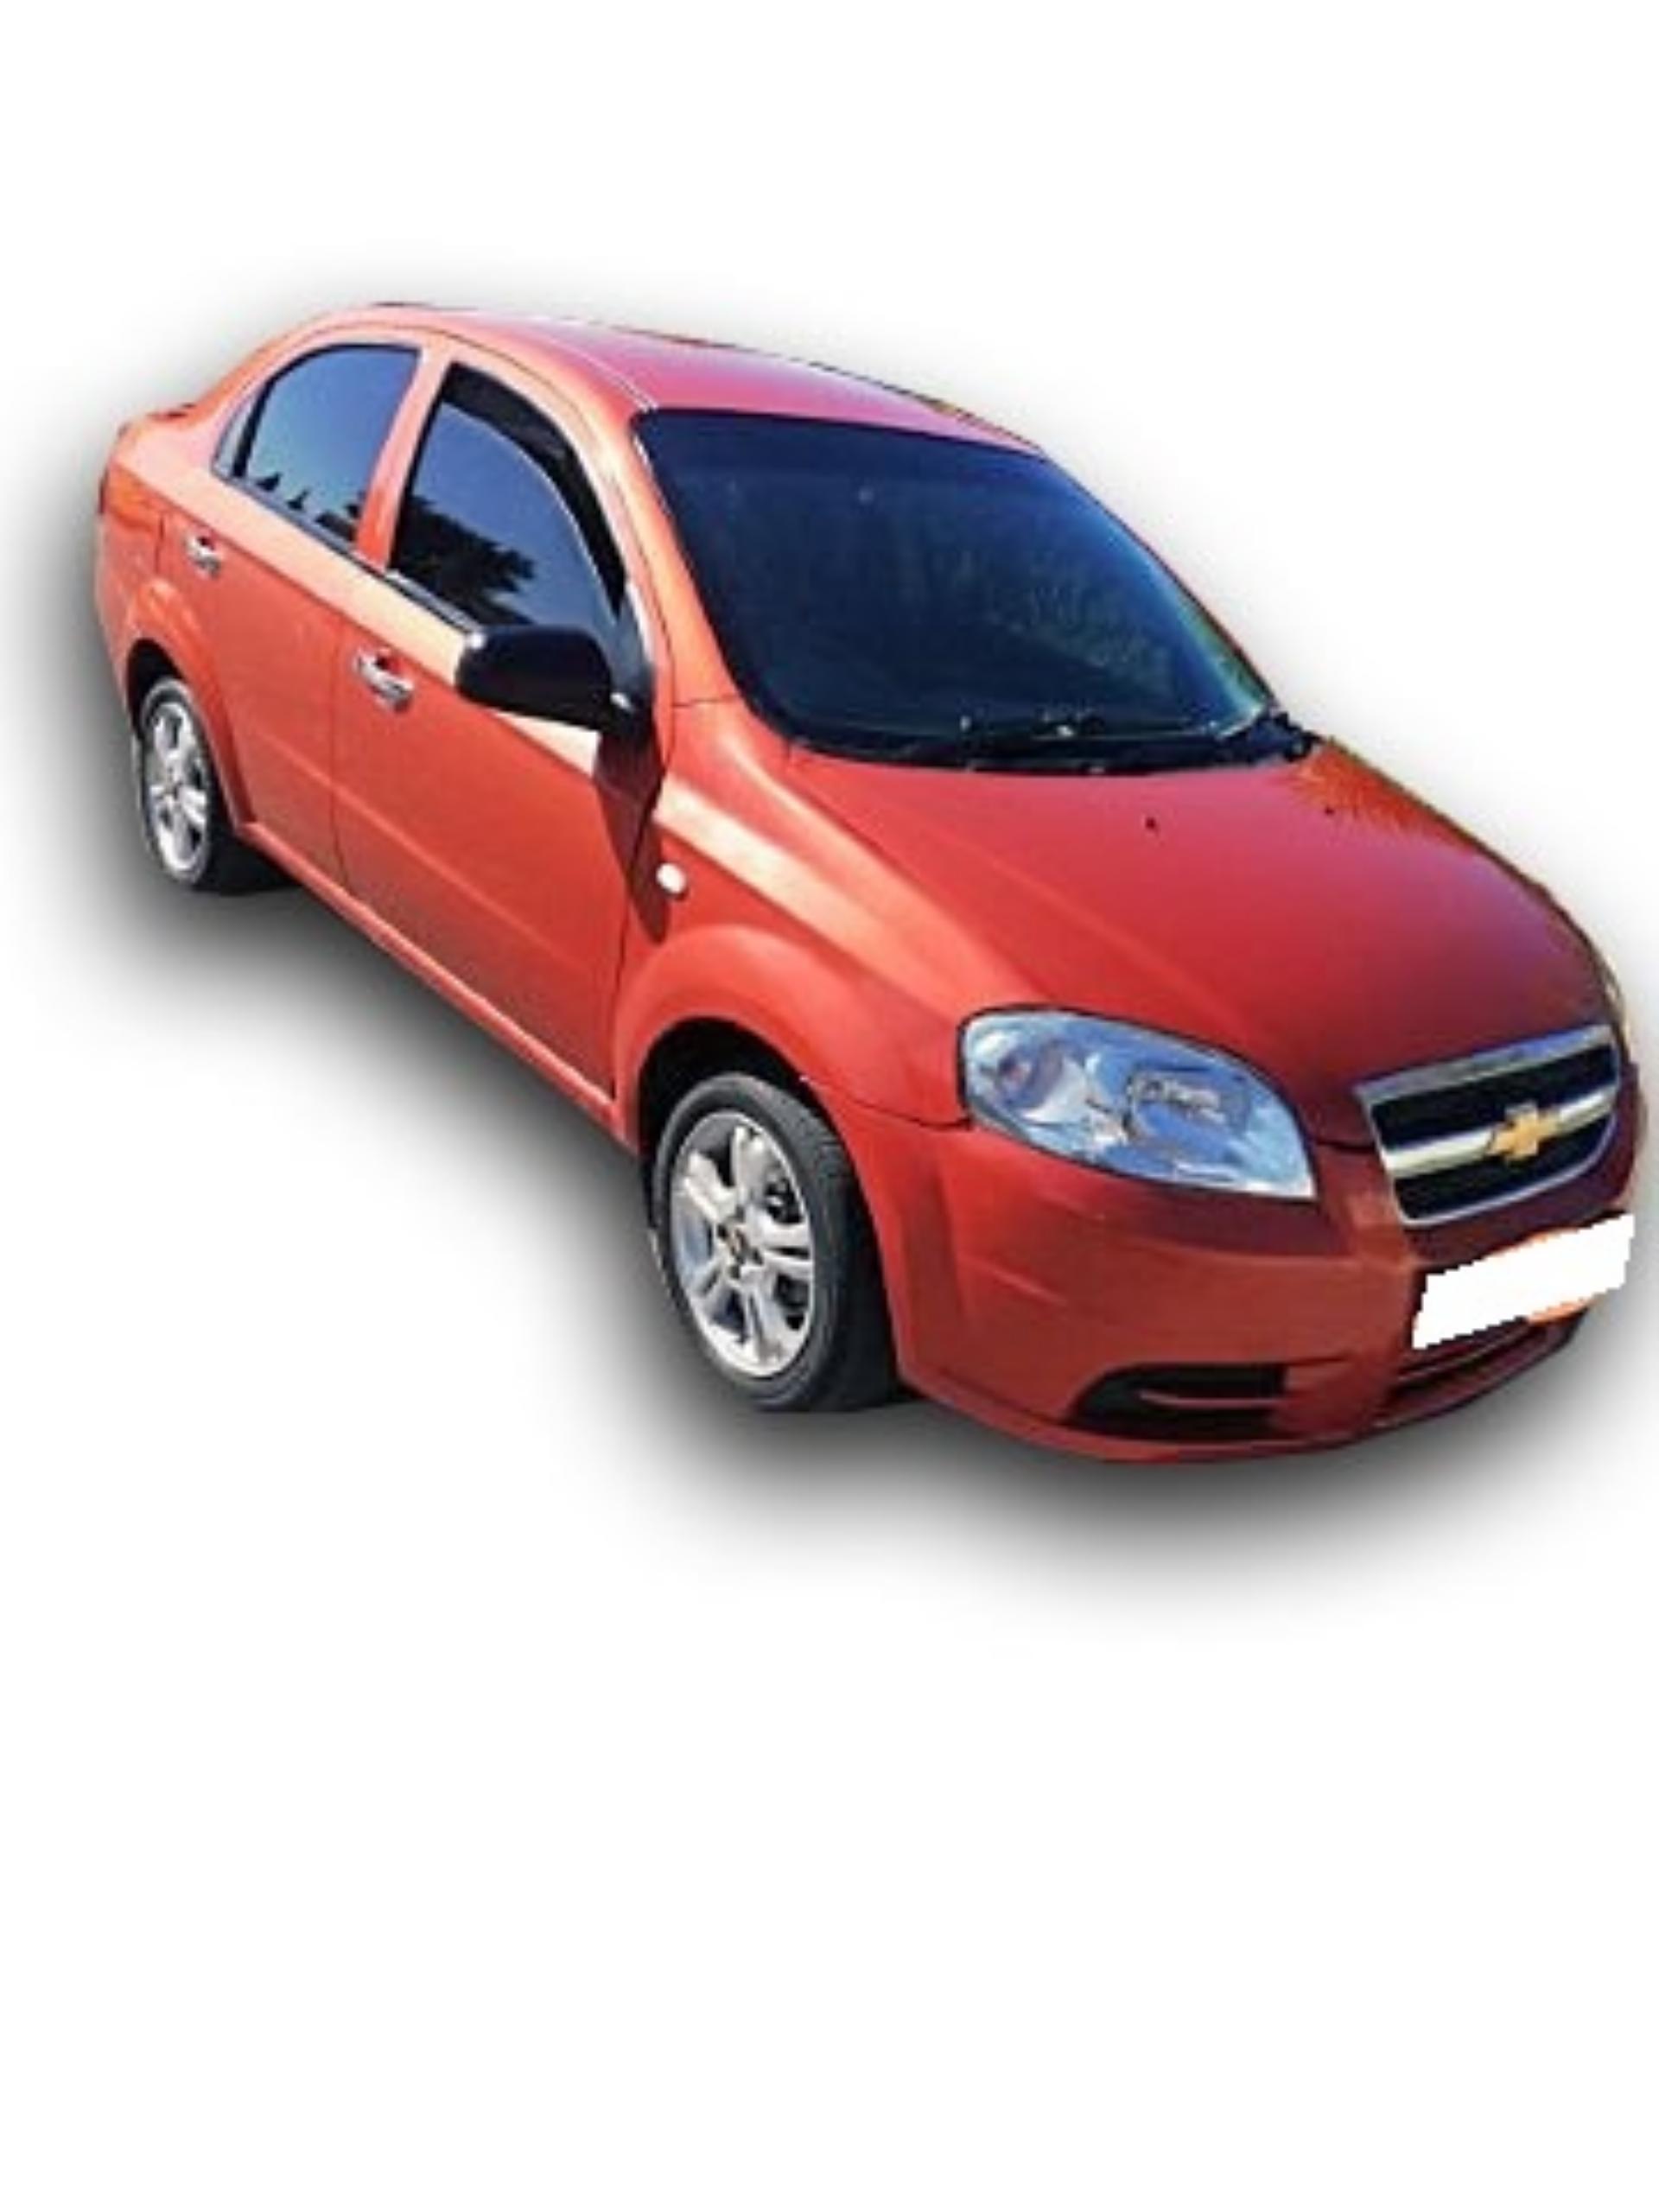 Chevrolet Aveo 1,6 Model